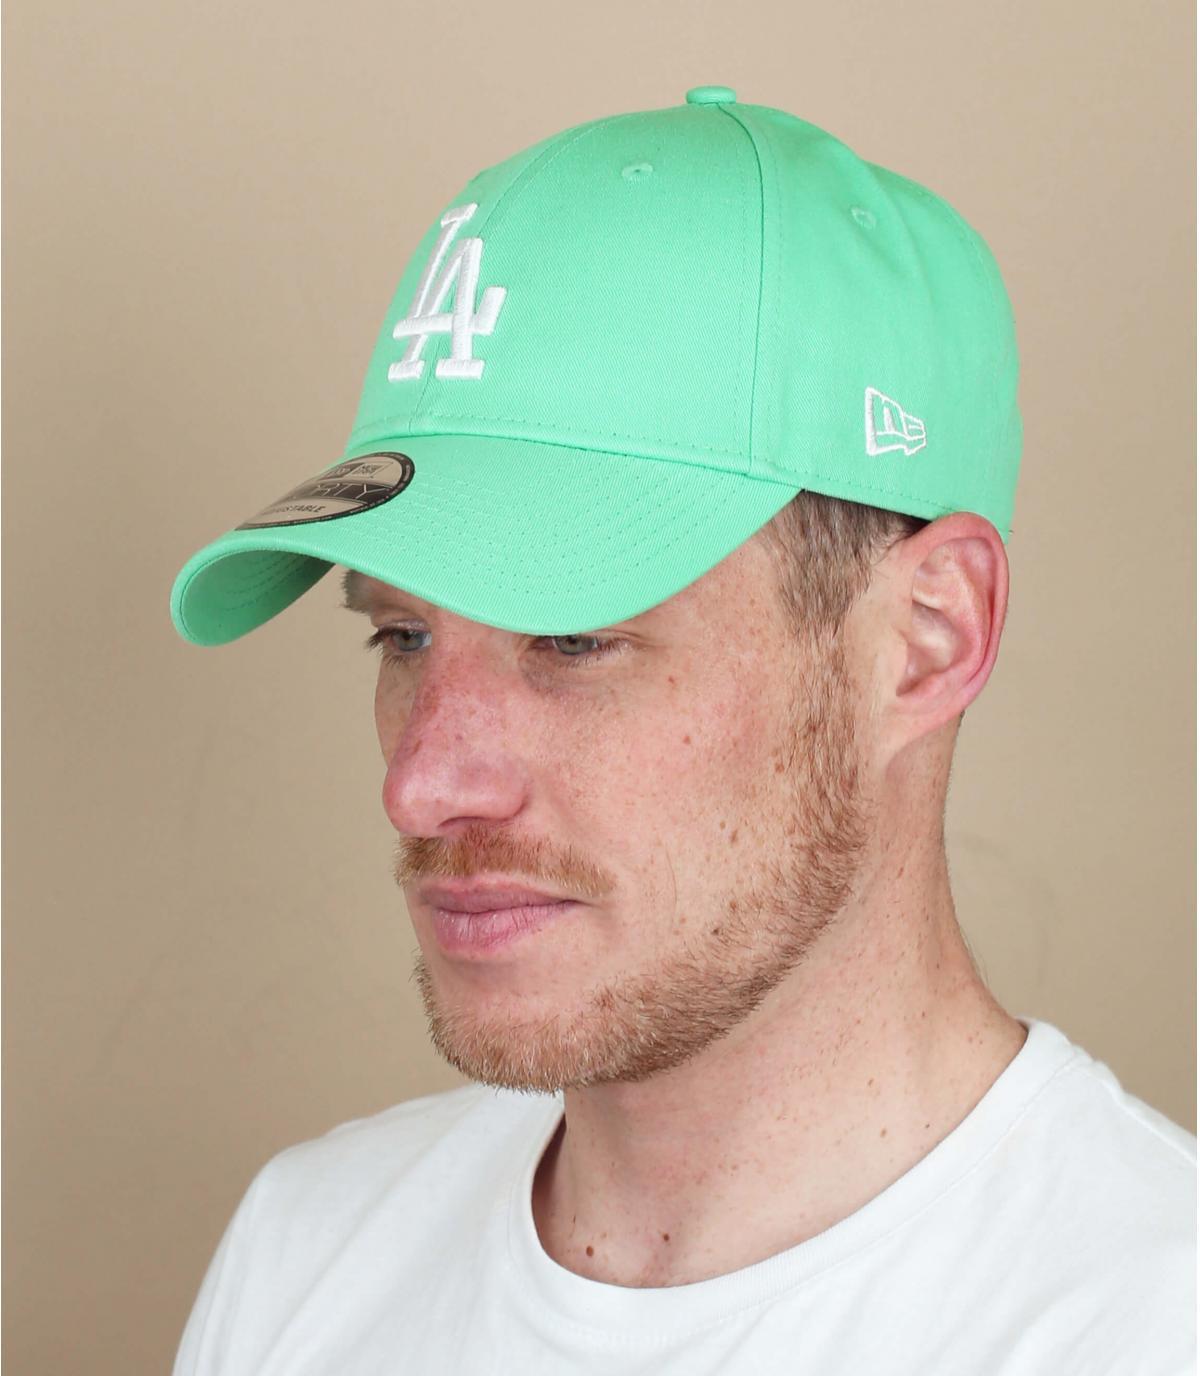 casquette LA bleu vert